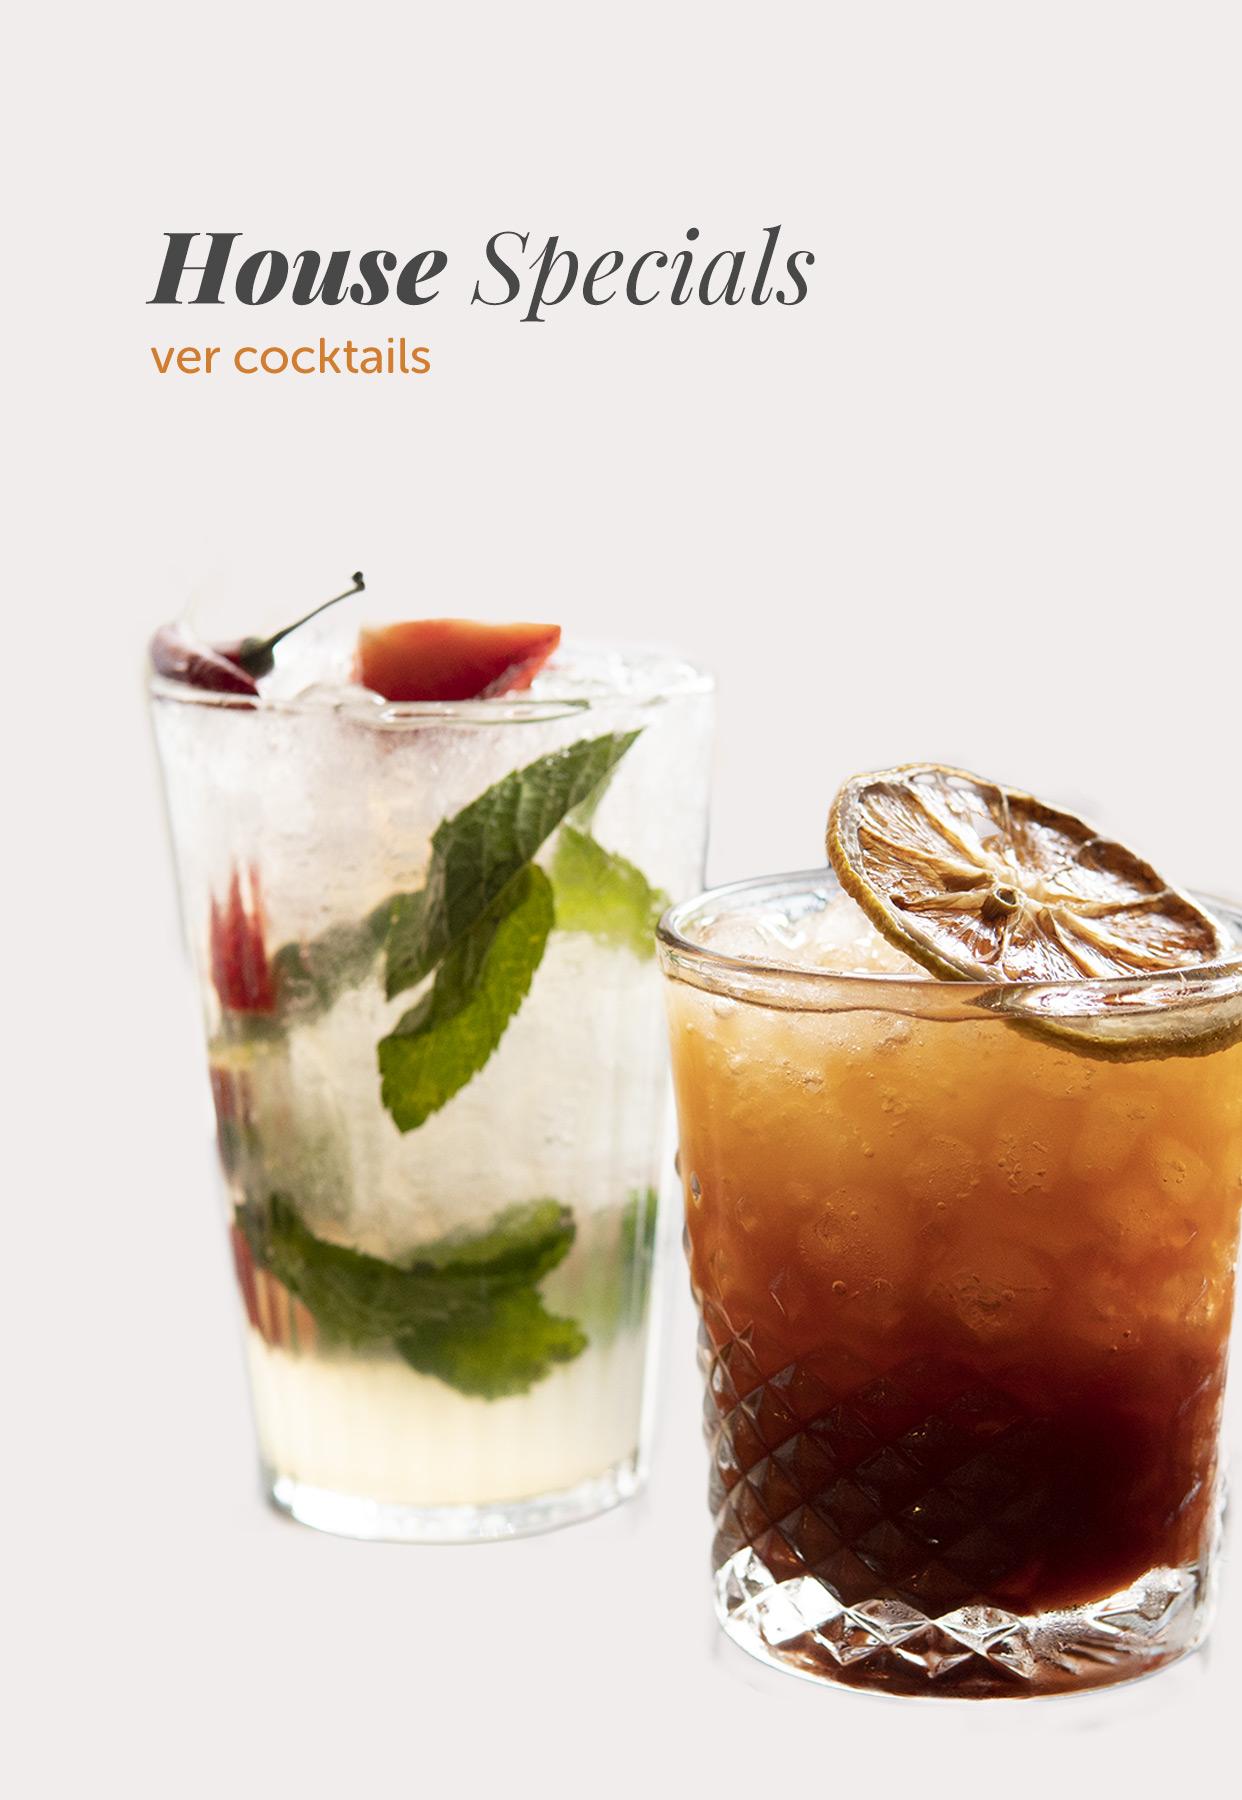 House Specials